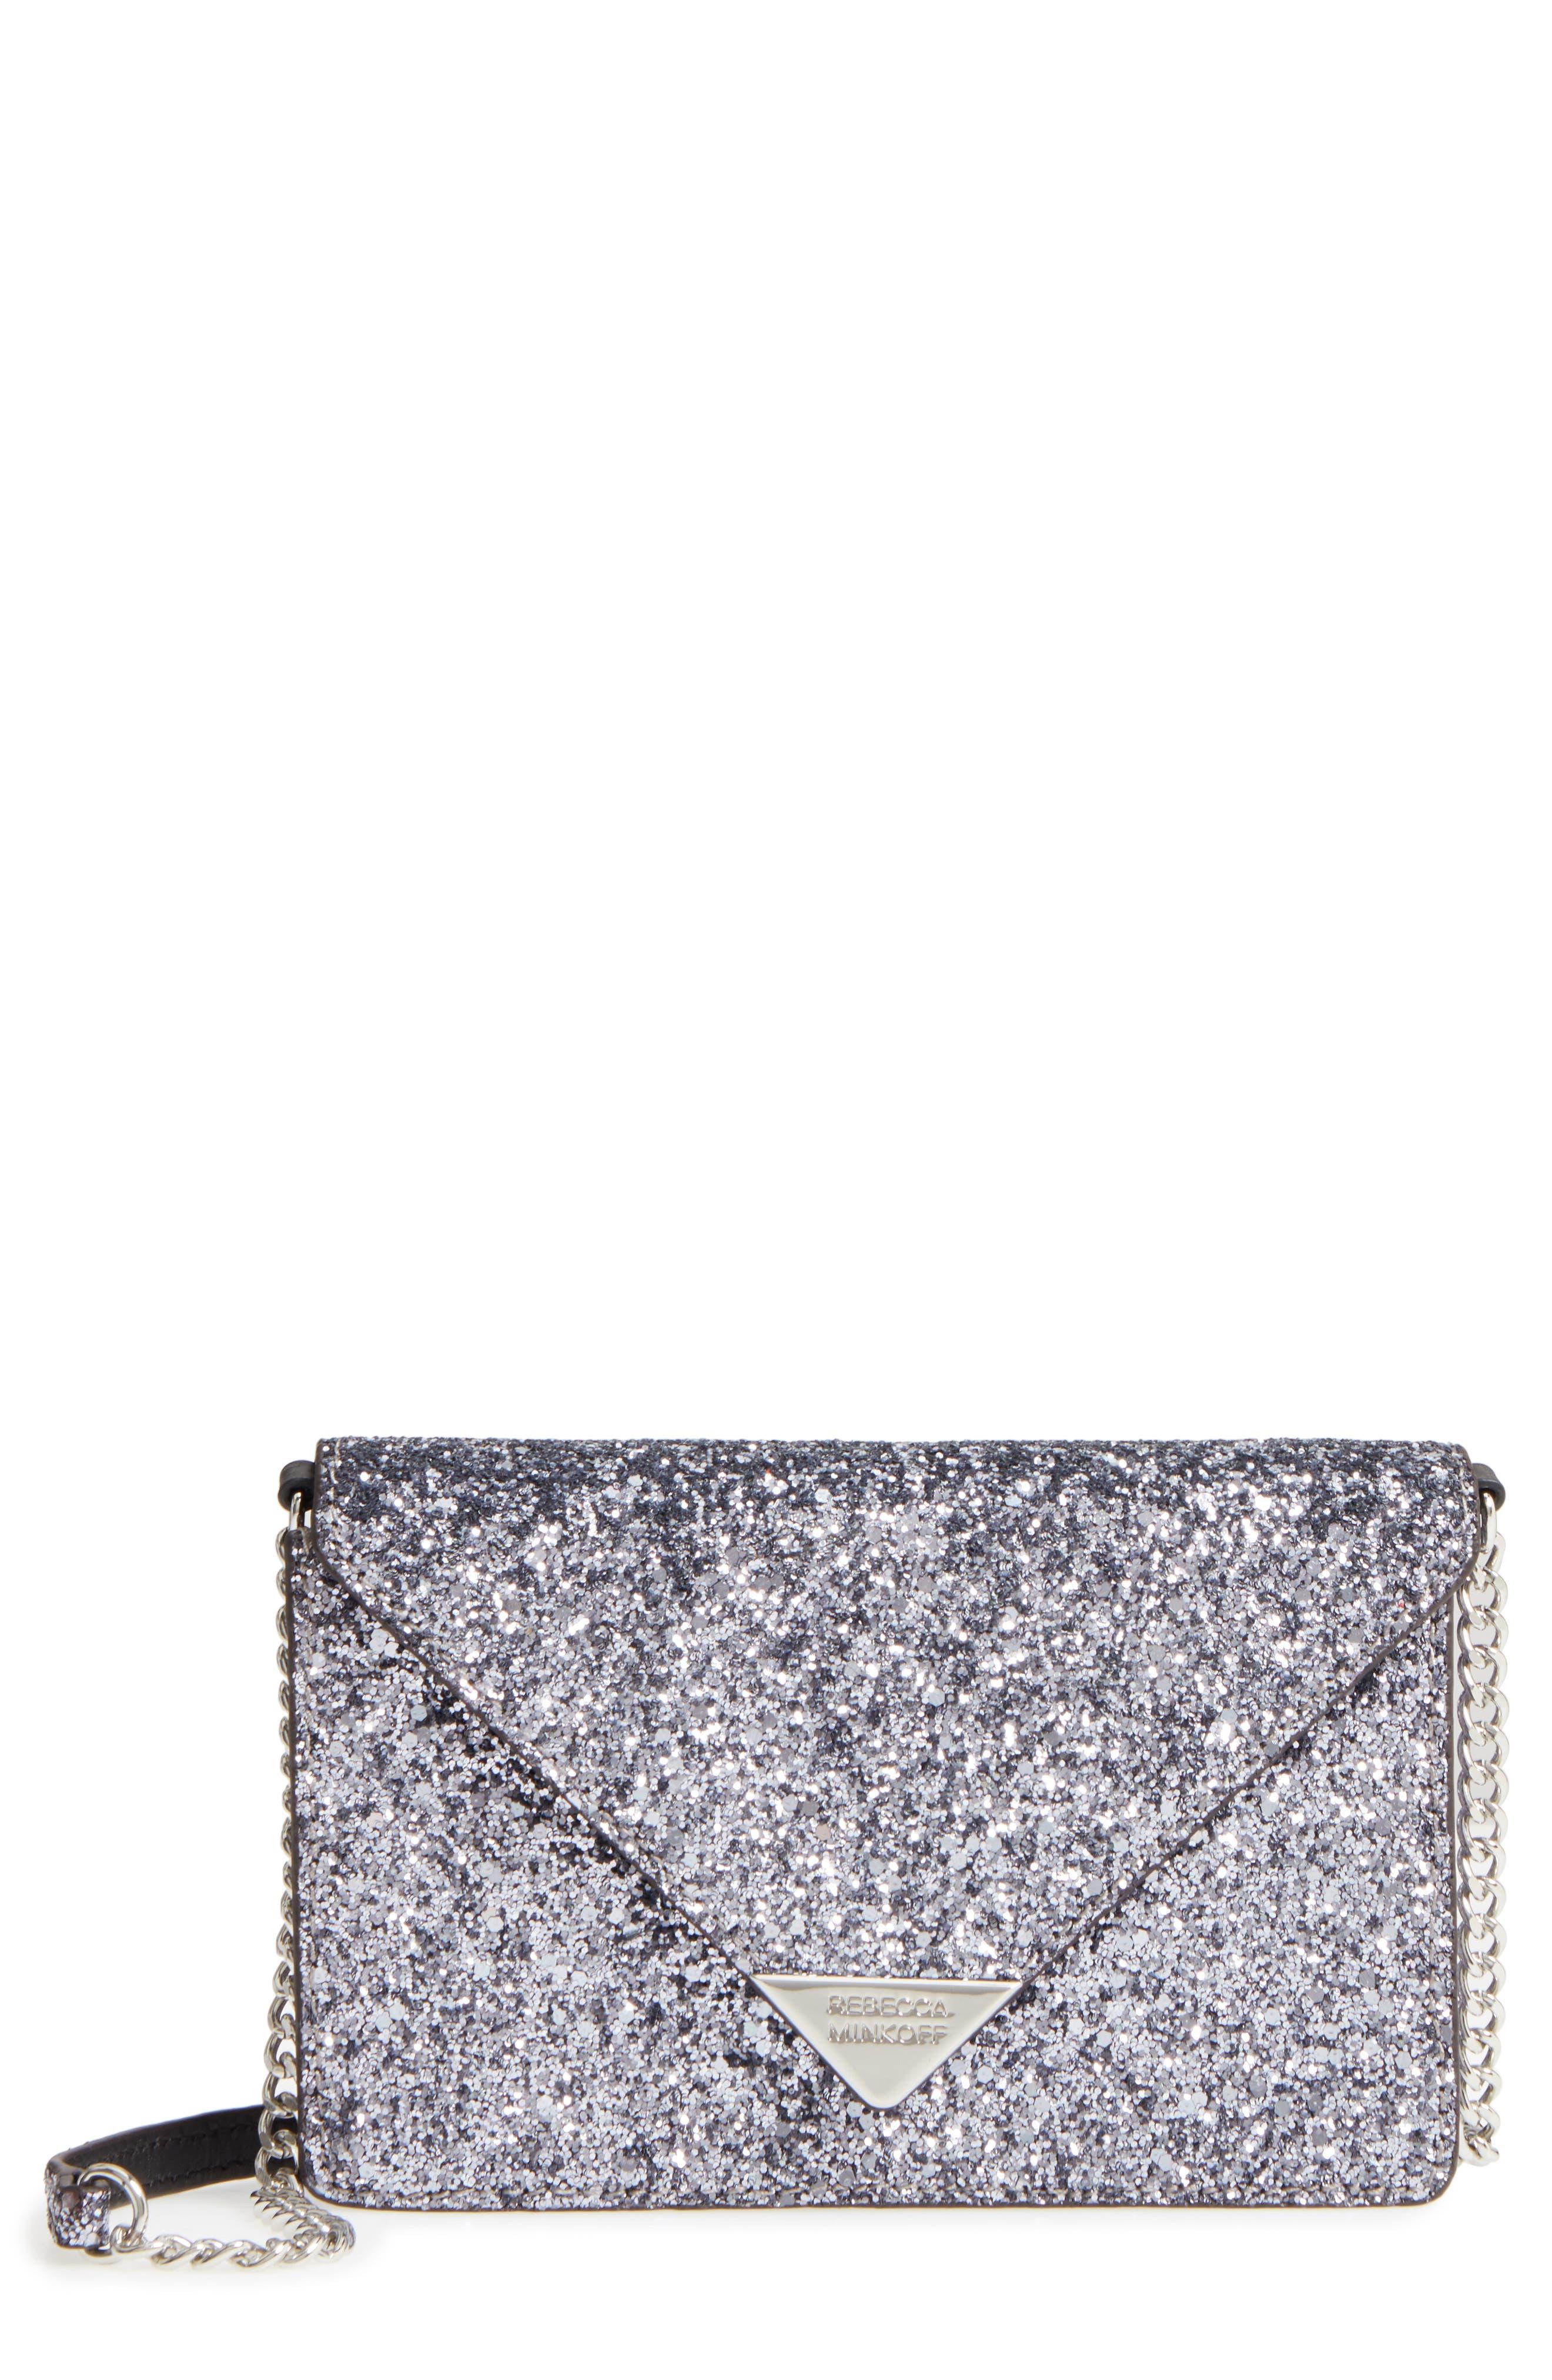 Molly Crossbody Bag,                             Main thumbnail 1, color,                             Silver